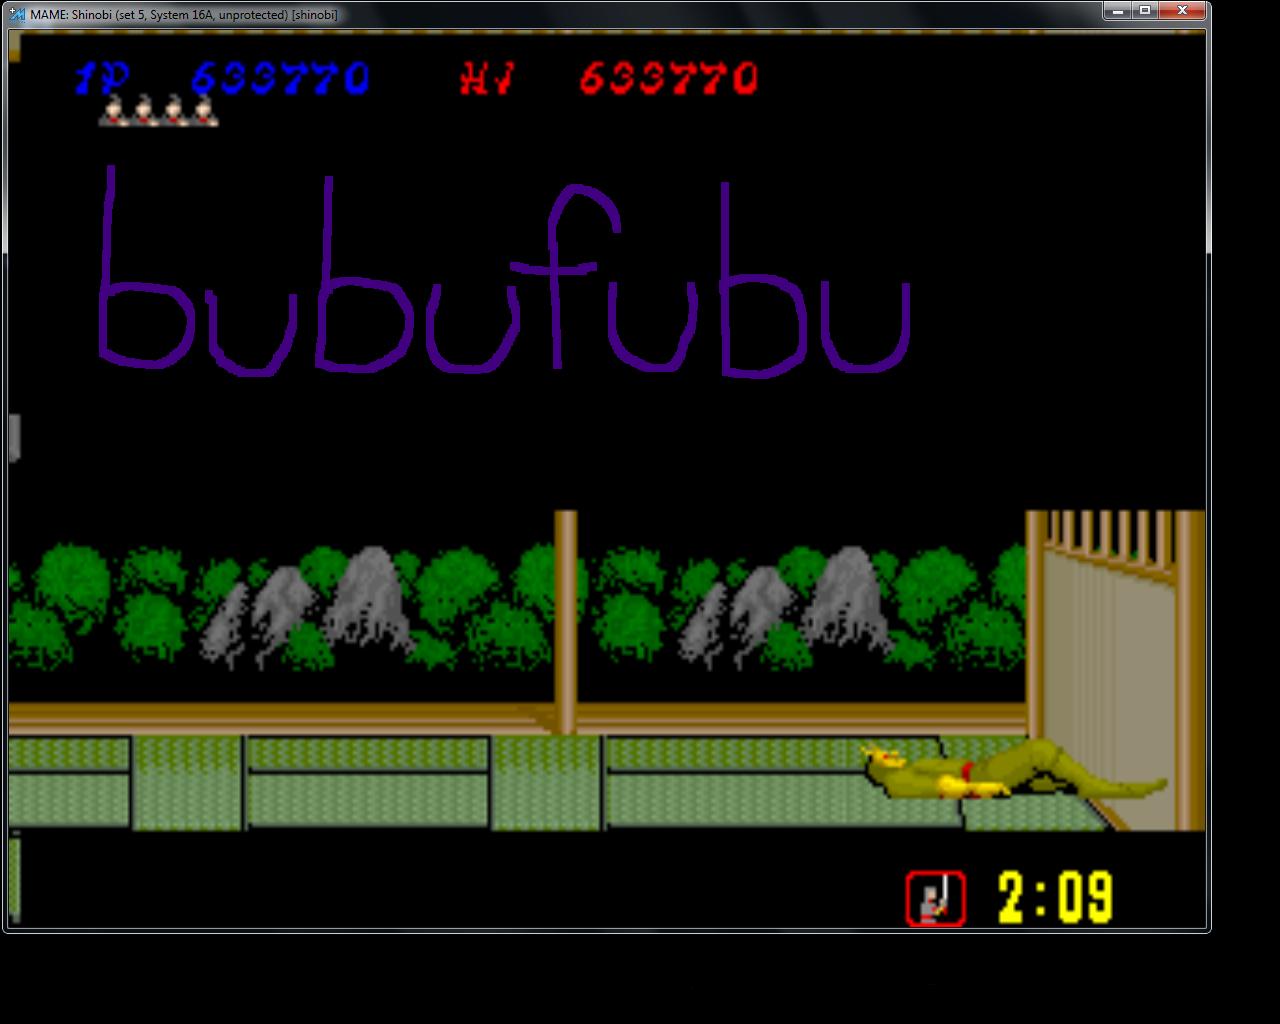 bubufubu: Shinobi (Arcade Emulated / M.A.M.E.) 633,770 points on 2015-05-07 20:55:07